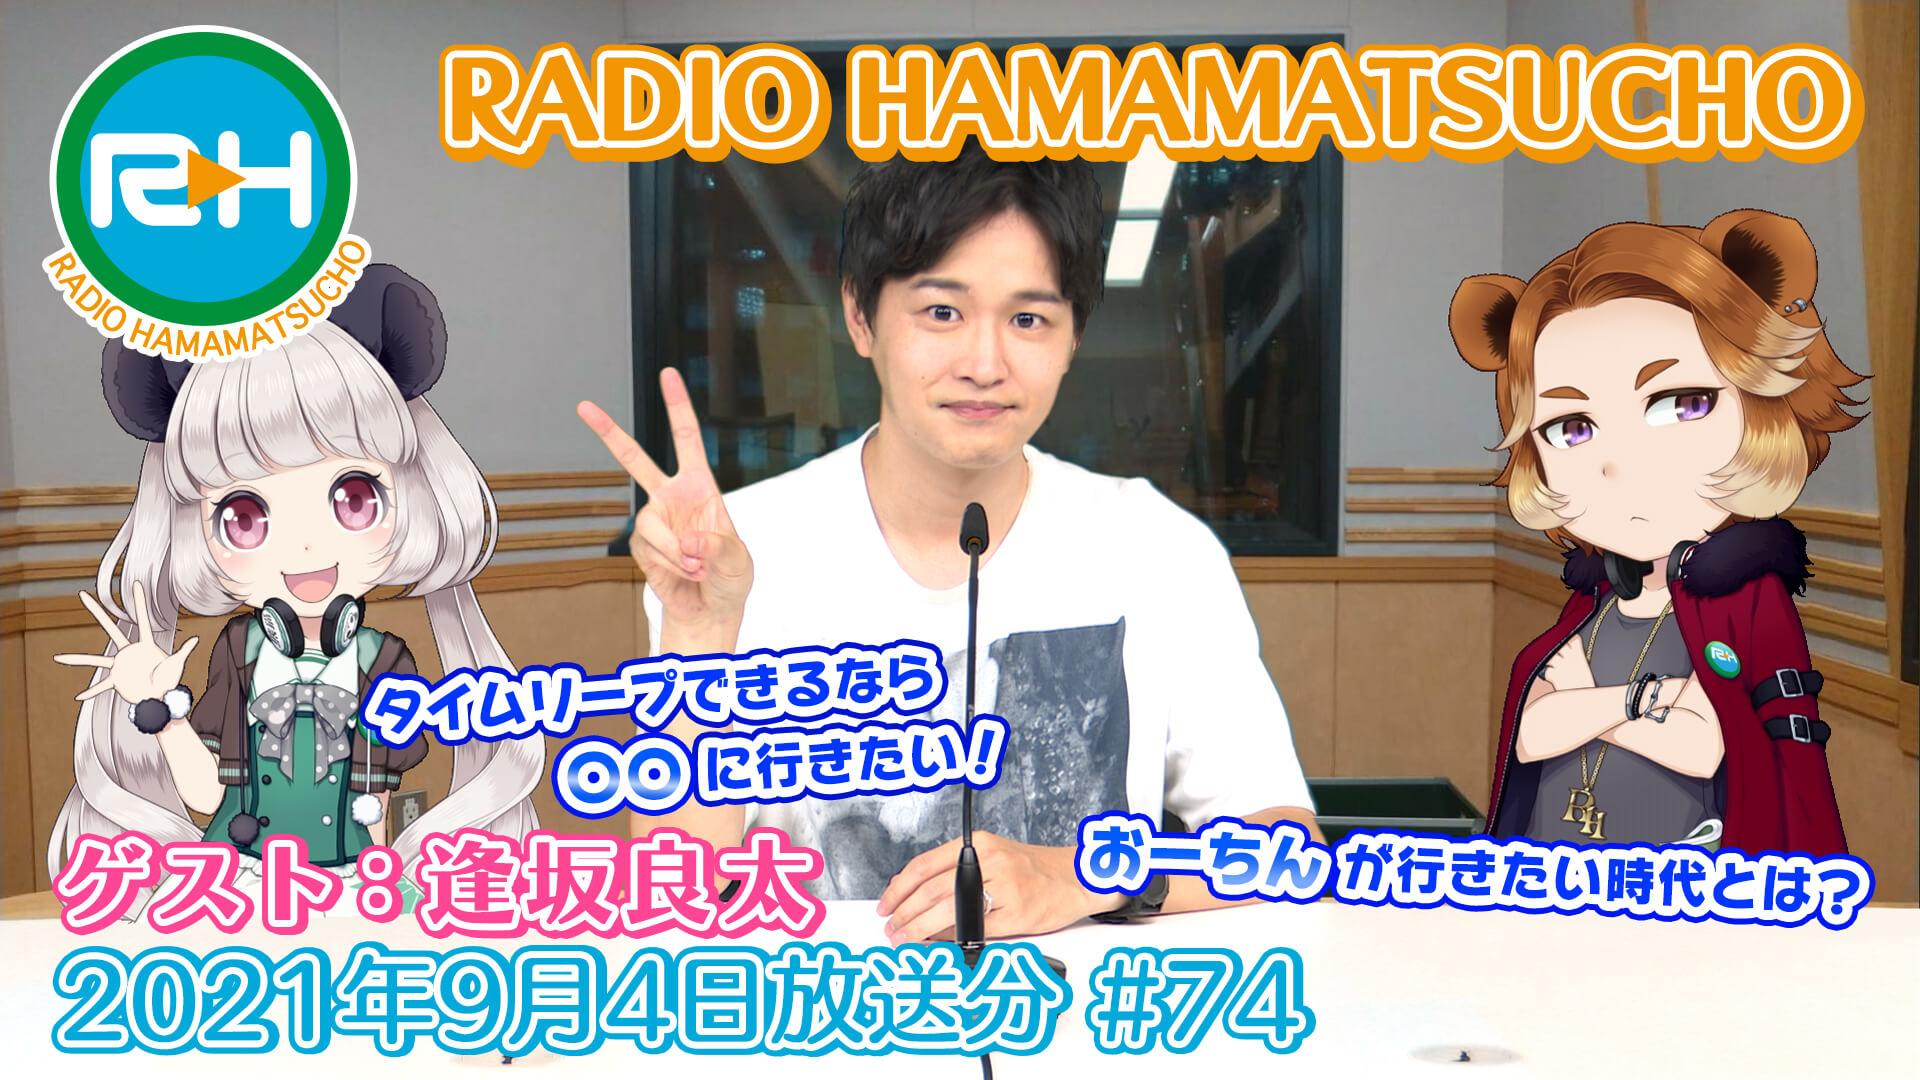 RADIO HAMAMATSUCHO 第74回 (2021年9月4日放送分) ゲスト: 逢坂良太